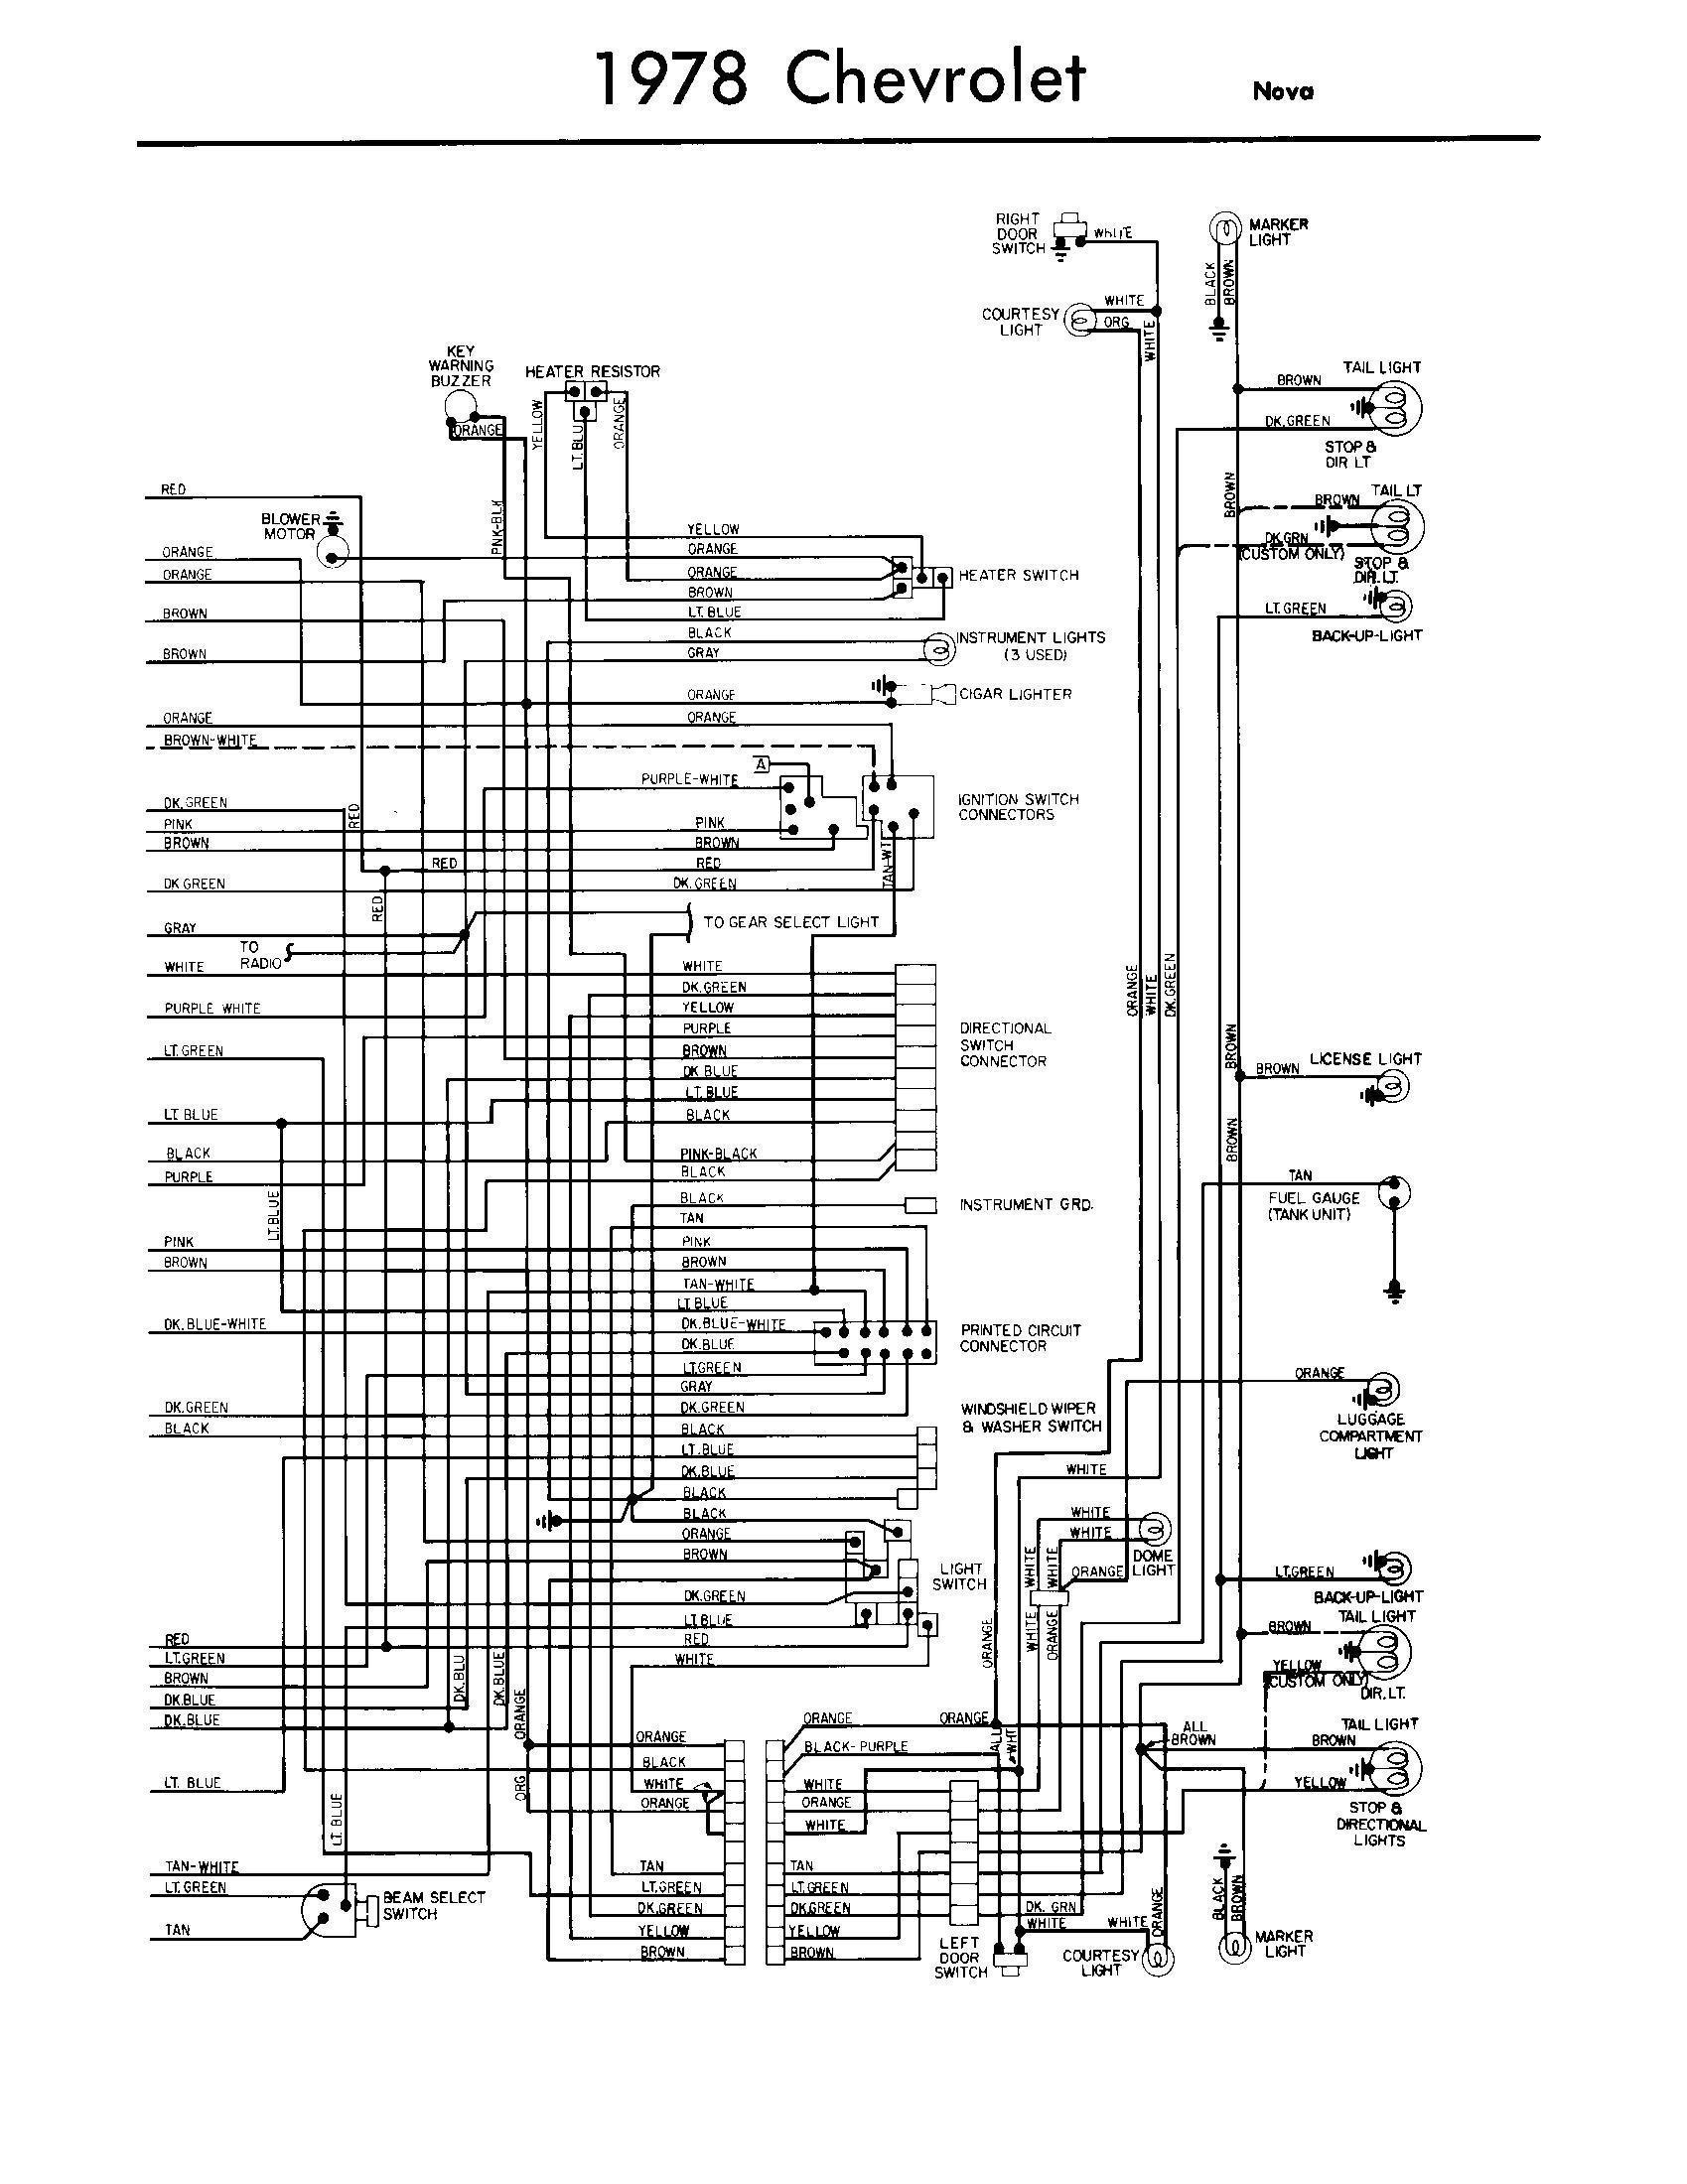 1979 Chevy Truck Radio Wiring Diagram 73 87 Chevy Truck Wiring Diagram Of 1979 Chevy Truck Radio Wiring Diagram